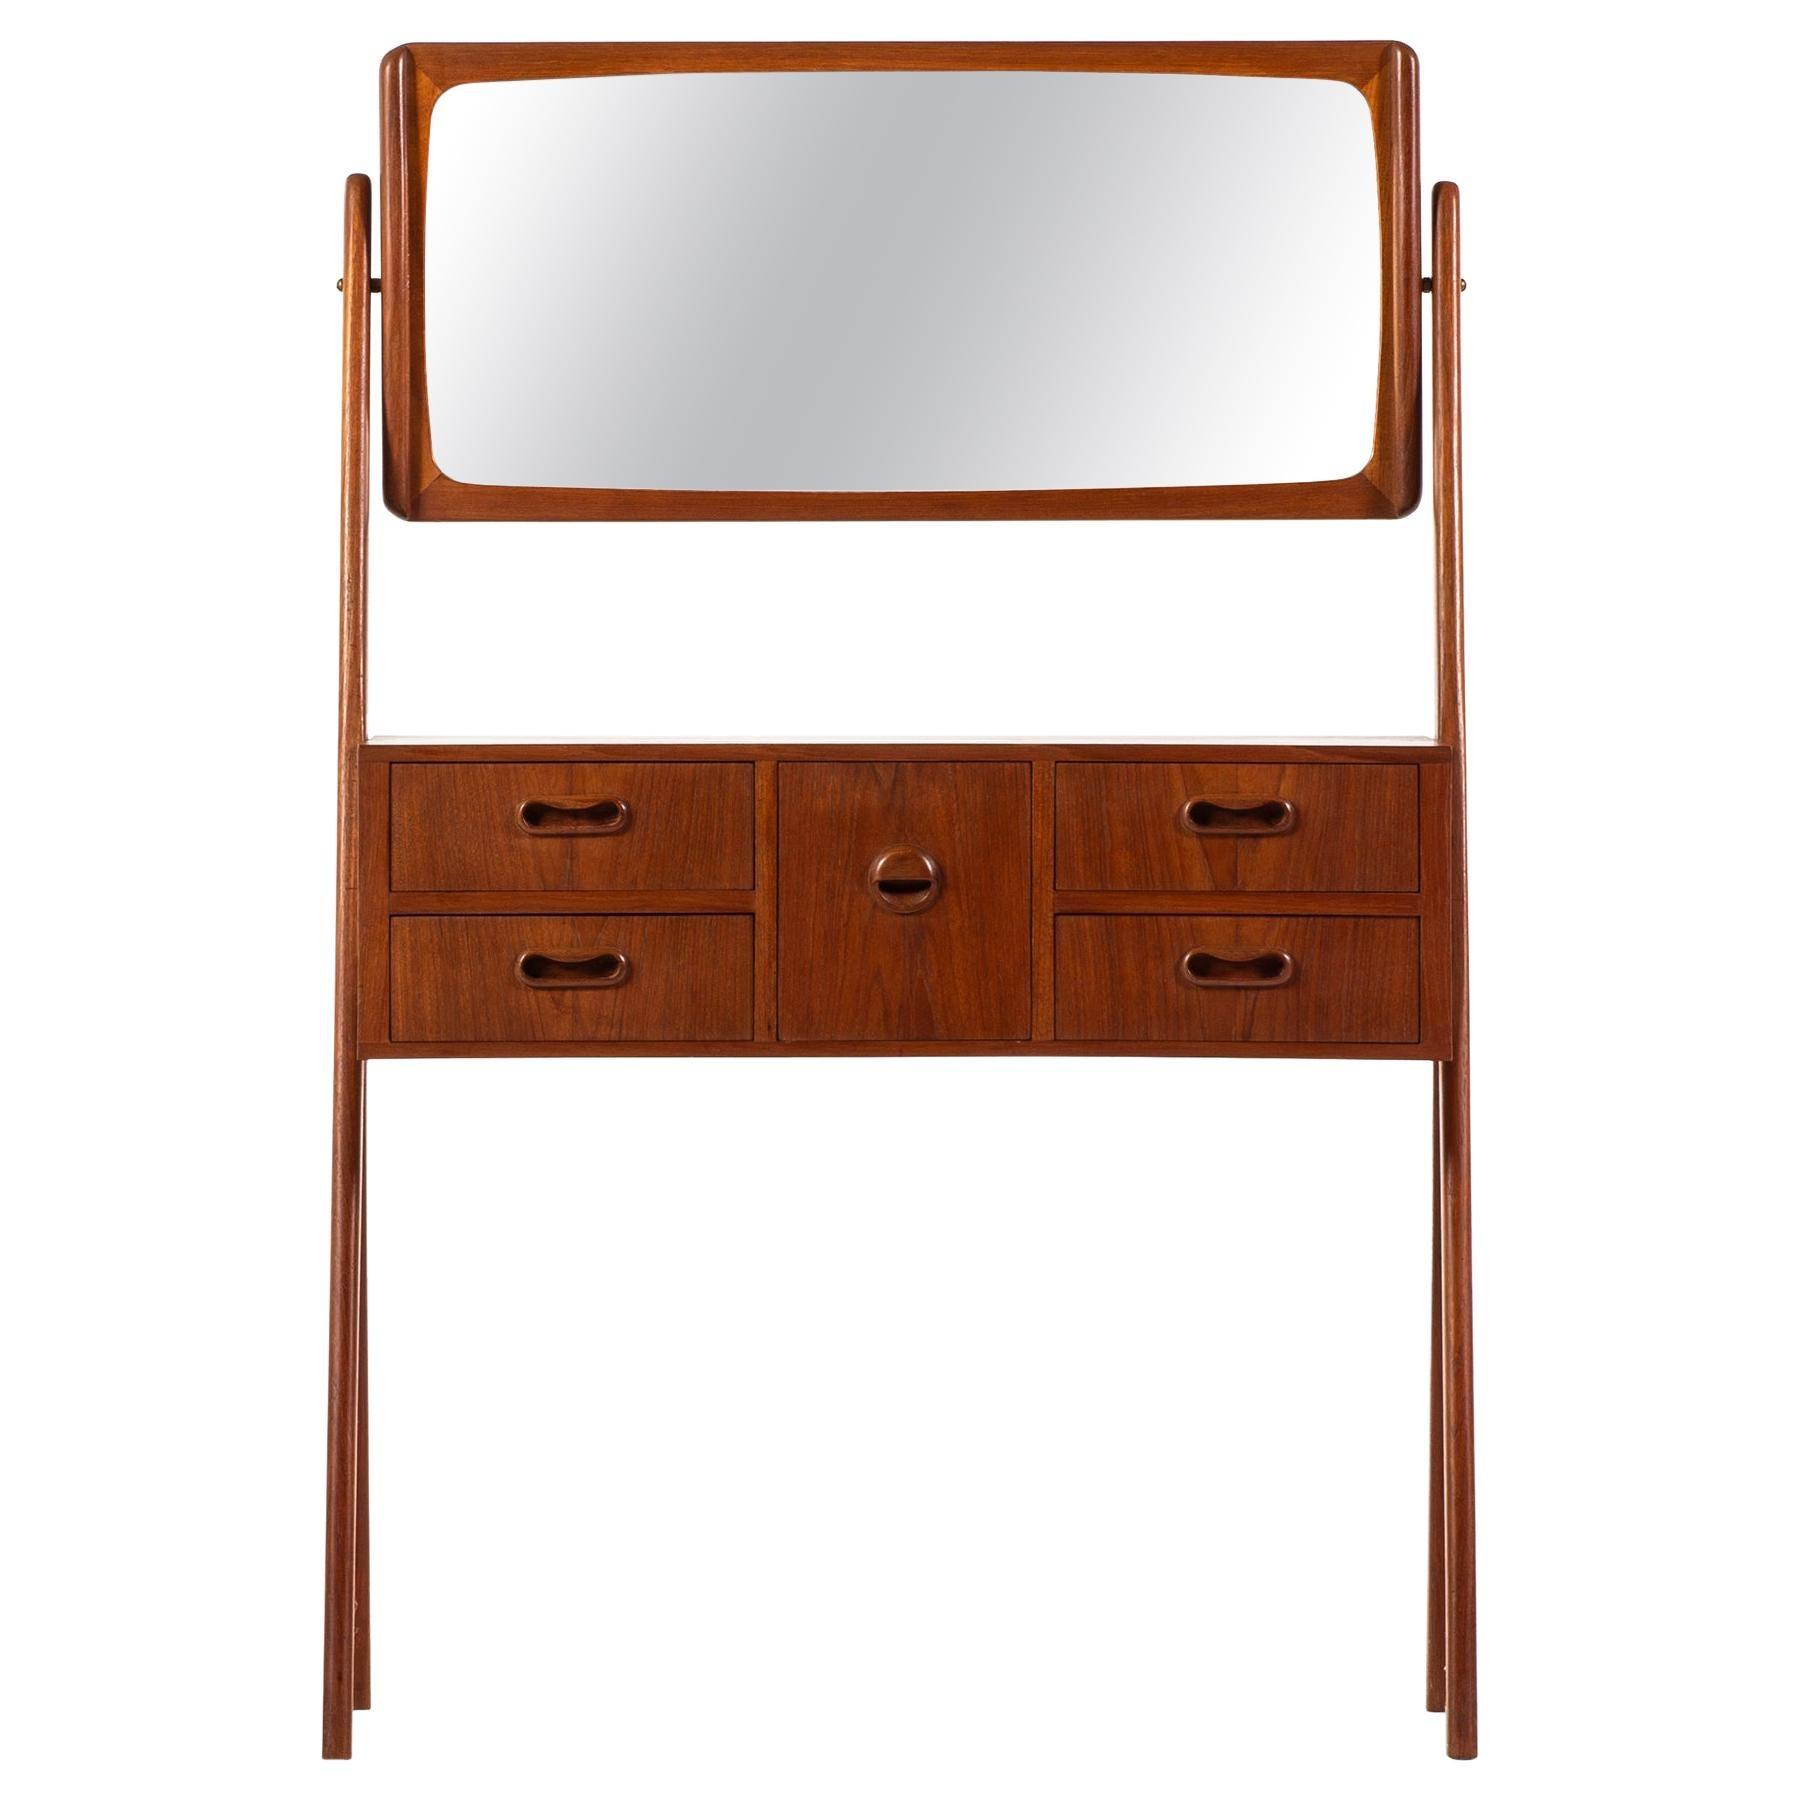 Teak Vanity / Dressing Table Produced in Denmark